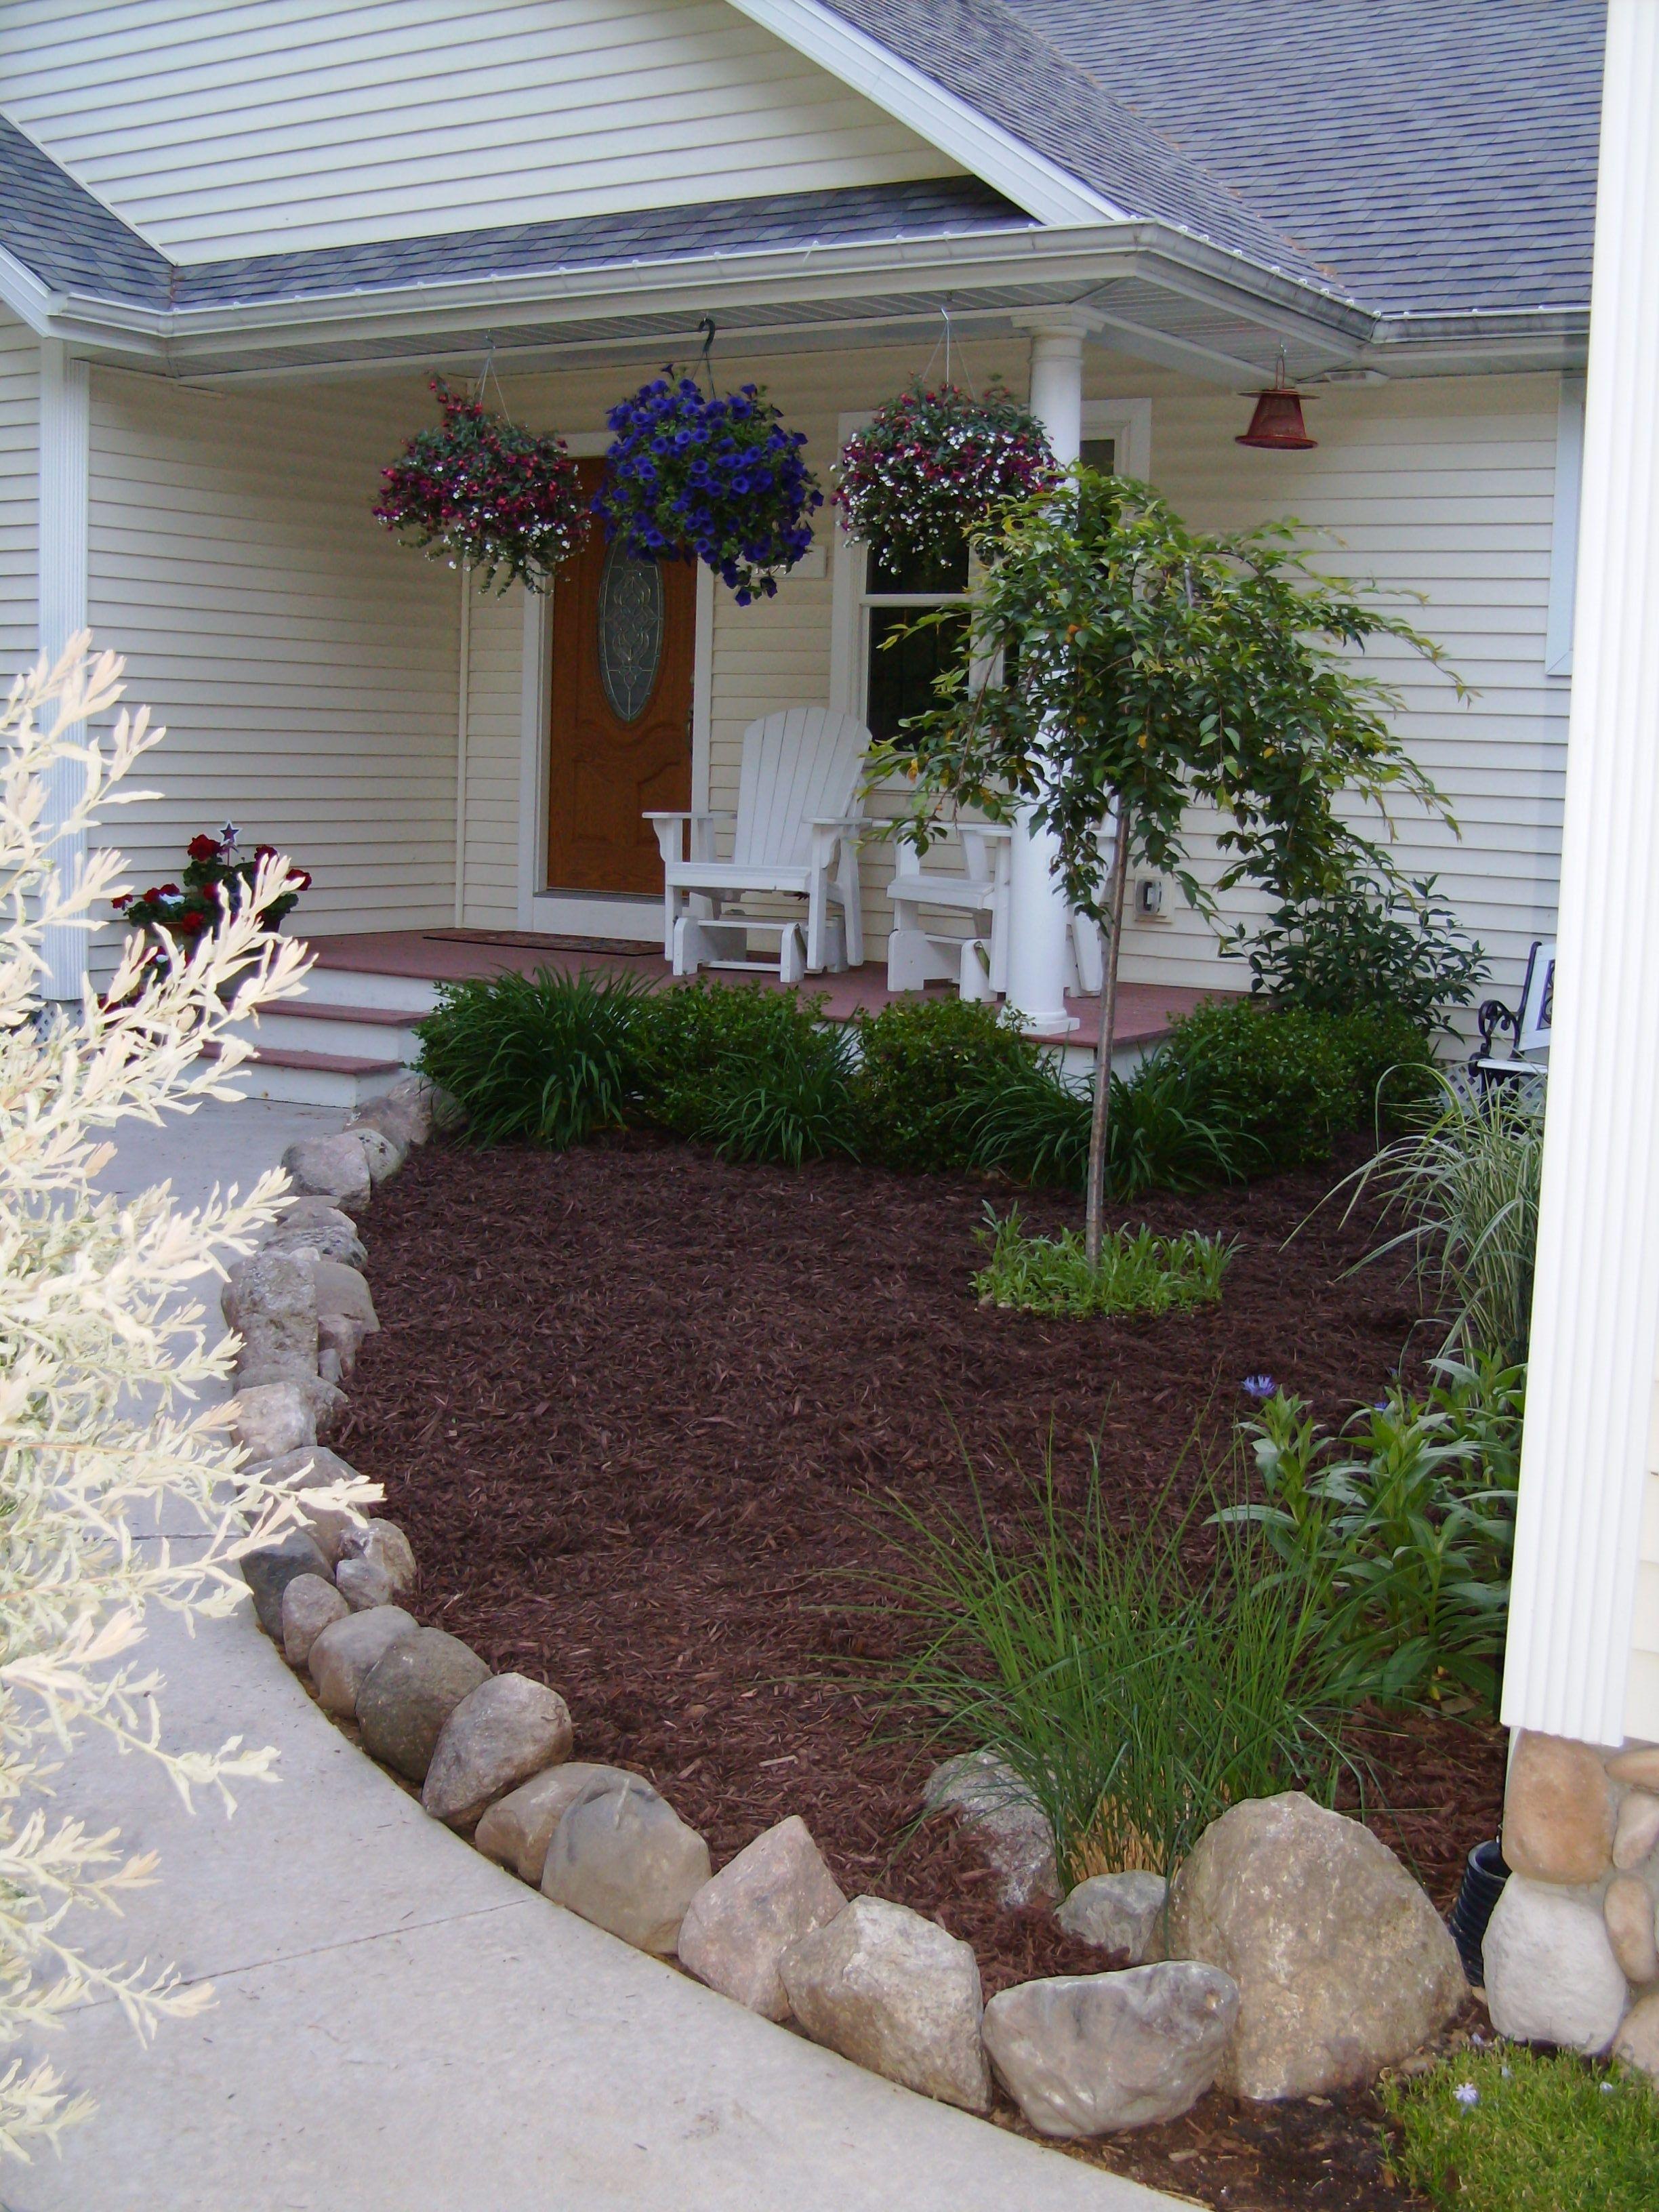 Simple front yard landscaping ideas calgary frontyardnaturewalk